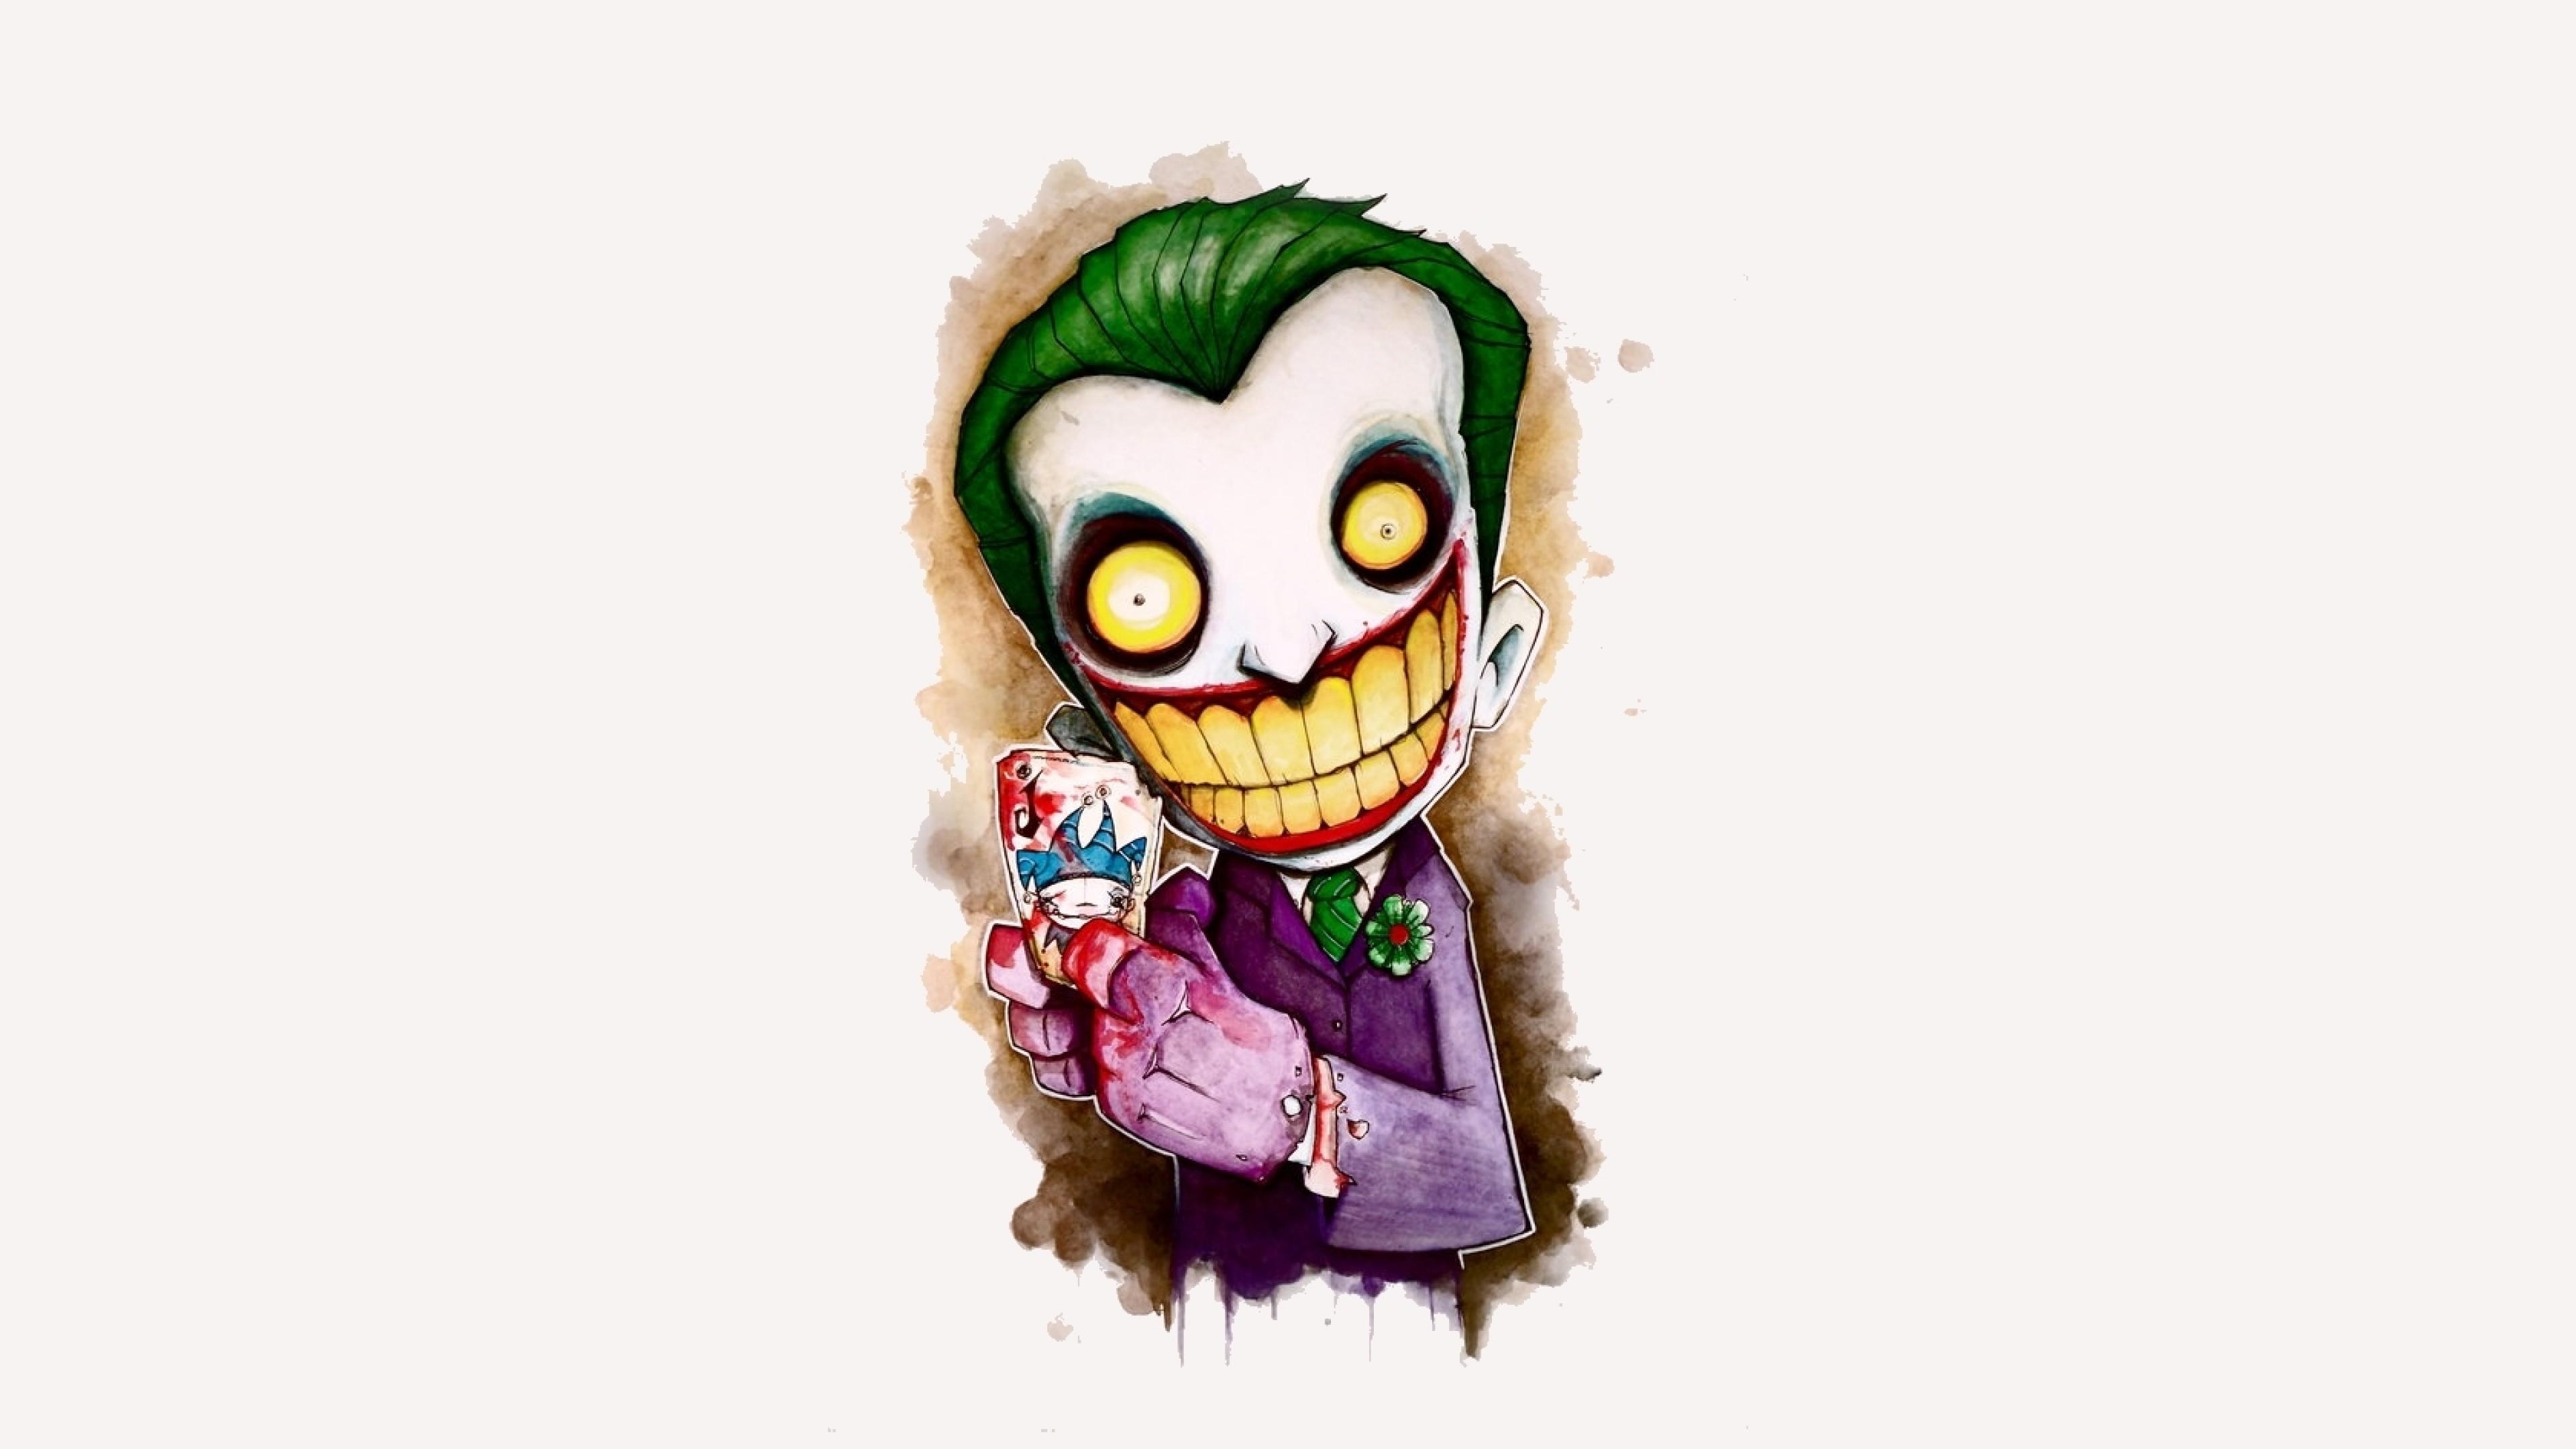 Joker Face Wallpaper }}Unnravvellingg   HD Wallpapers   Pinterest   Joker,  Joker pictures and Wallpaper